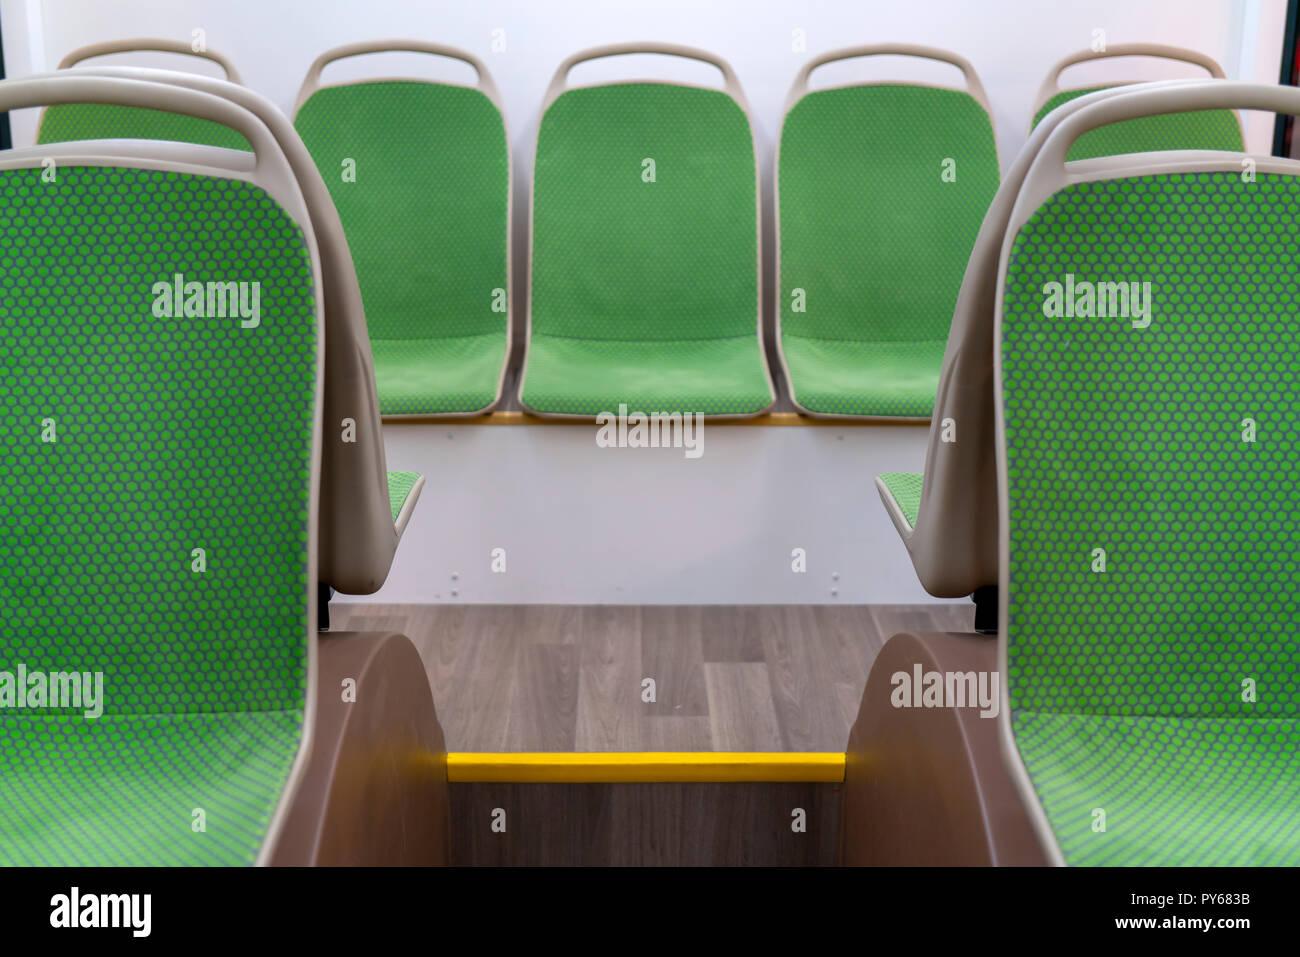 Salon Moderne Bus. Sitzplätze für Passagiere Stockfoto, Bild ...